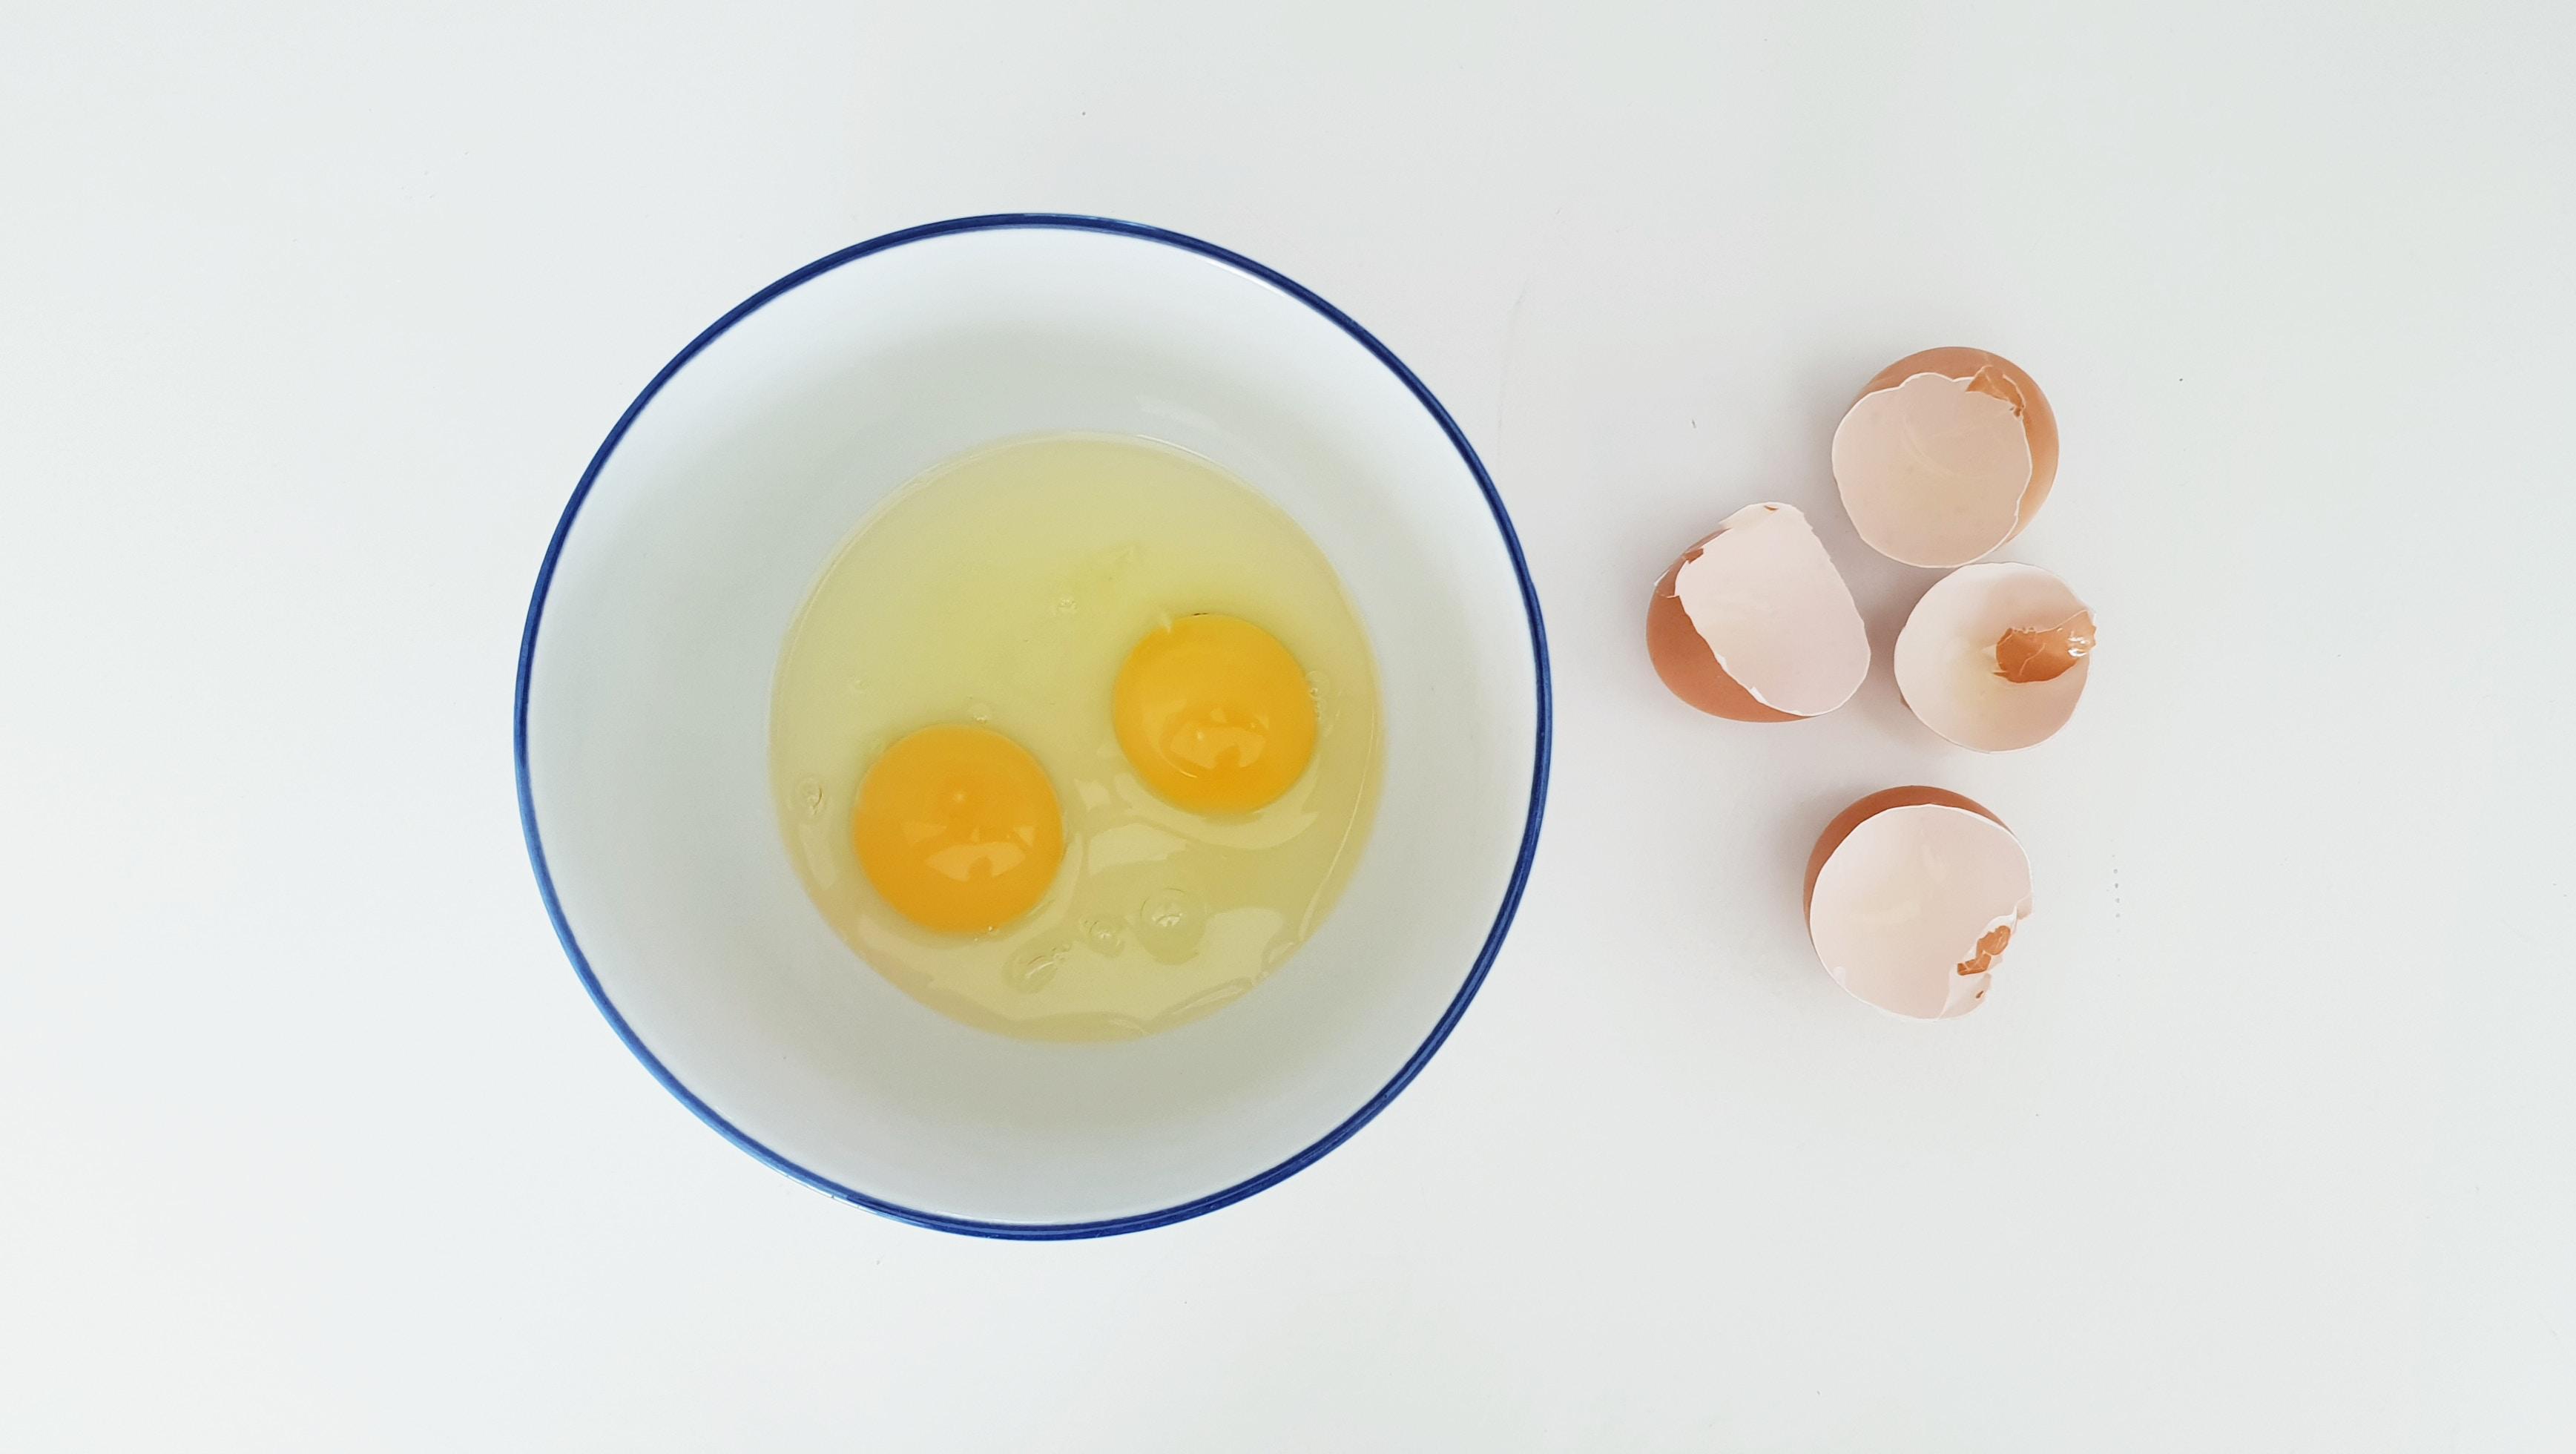 ovulation and fertility